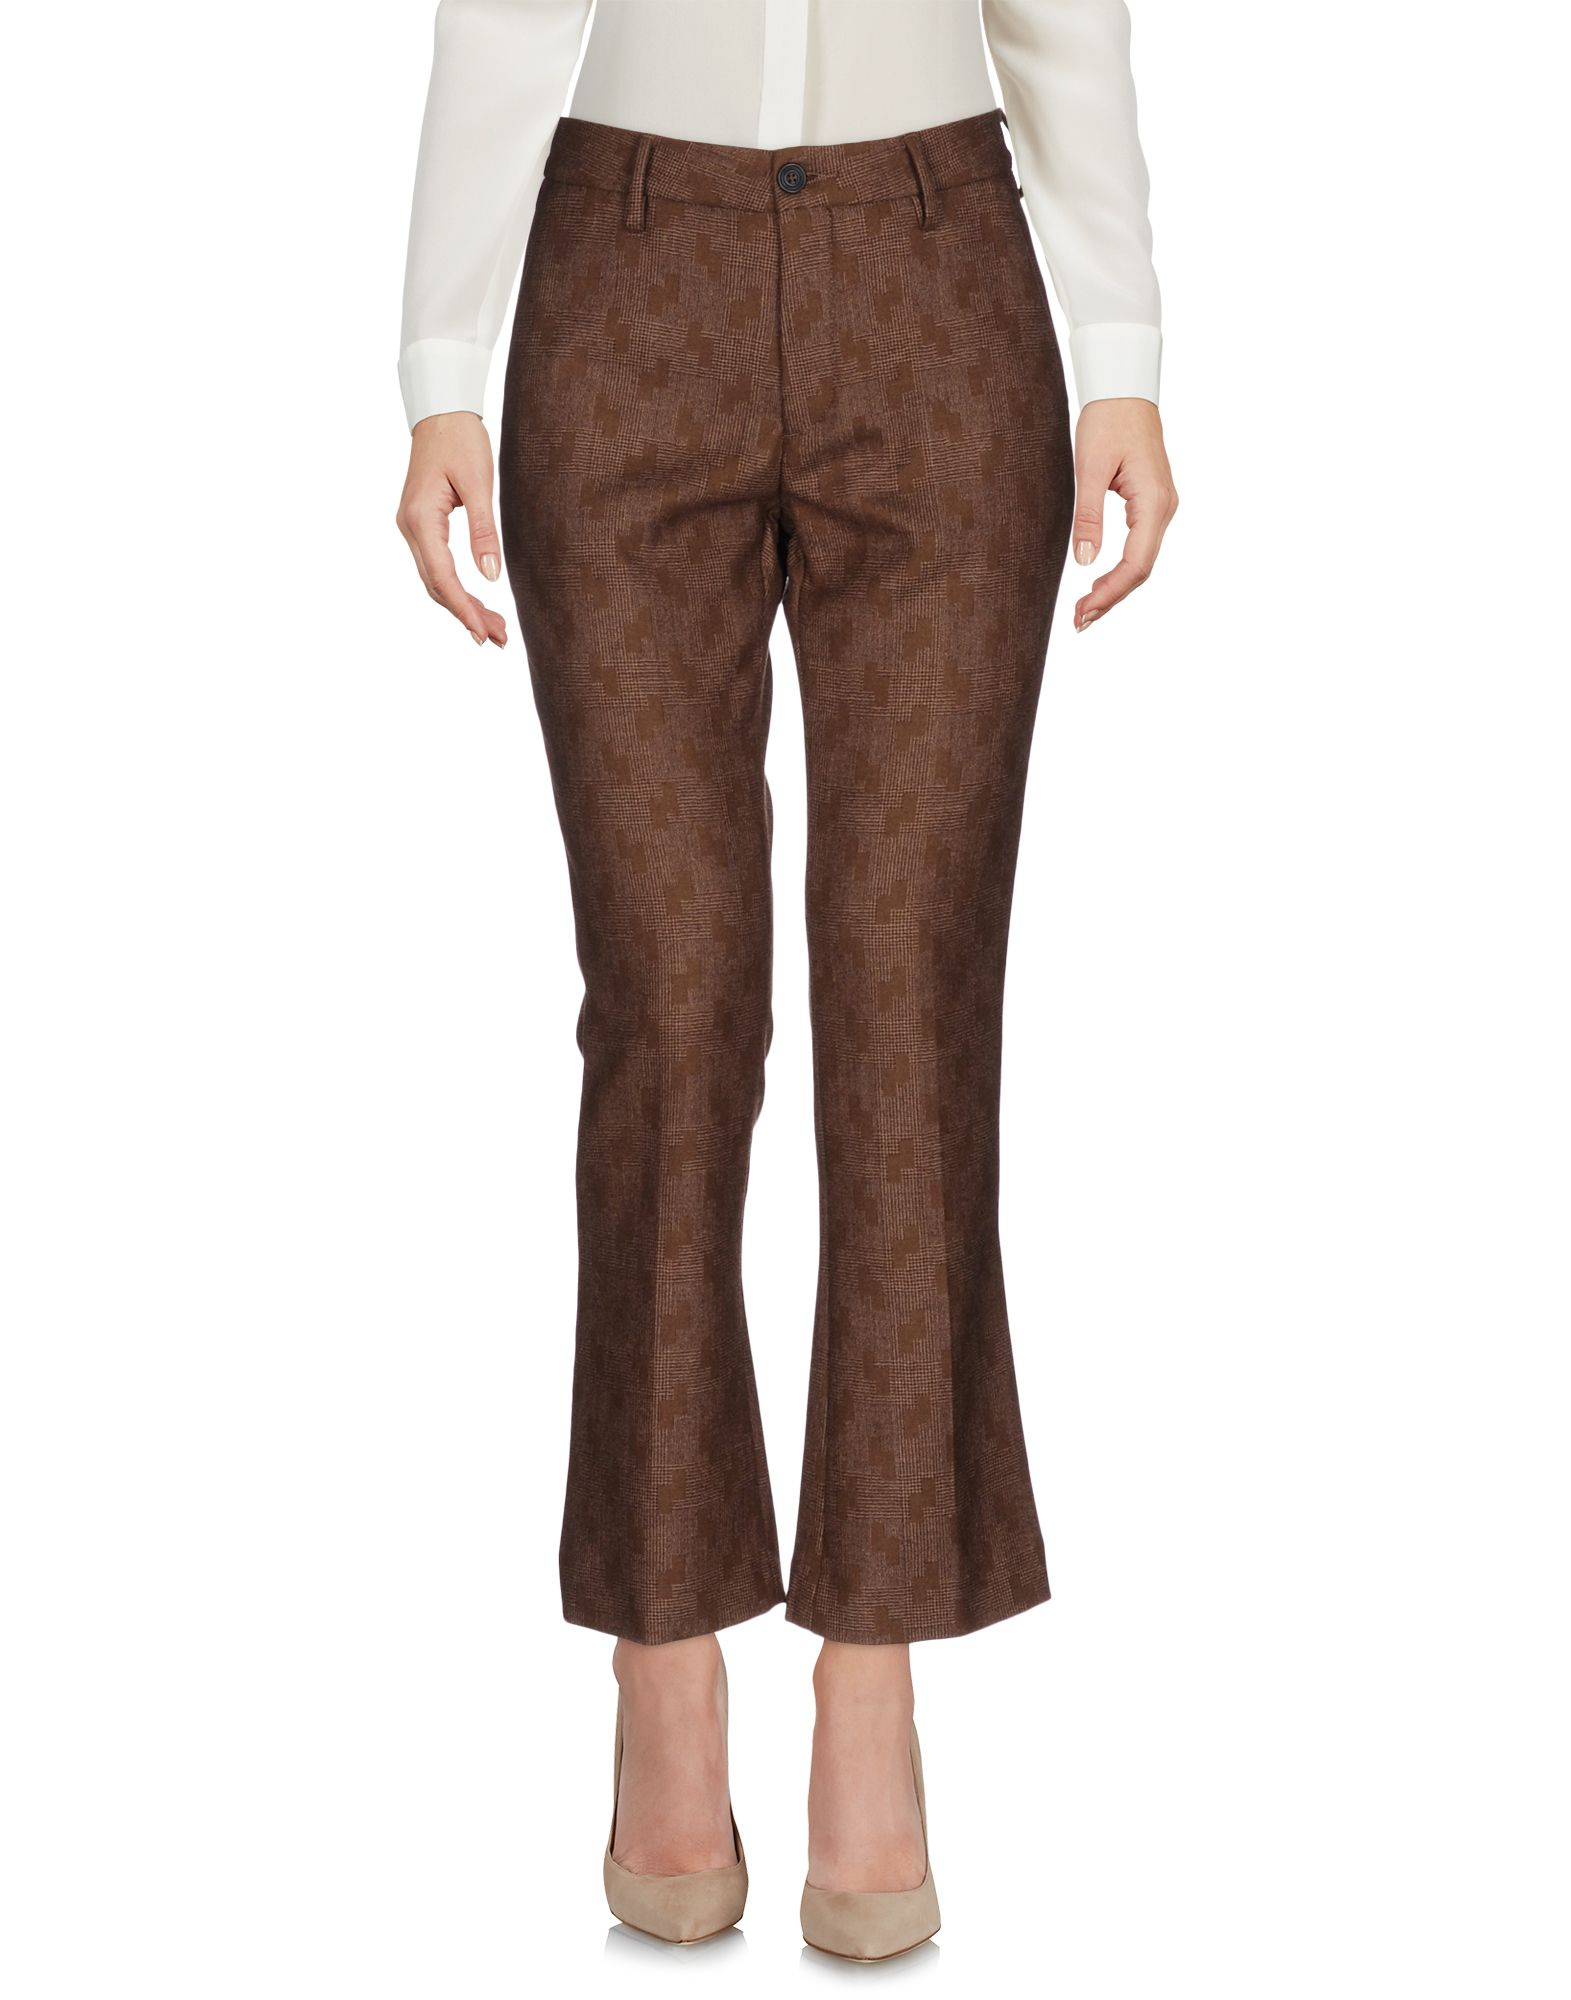 Pantalone Pence Donna - Acquista online su lWLGX